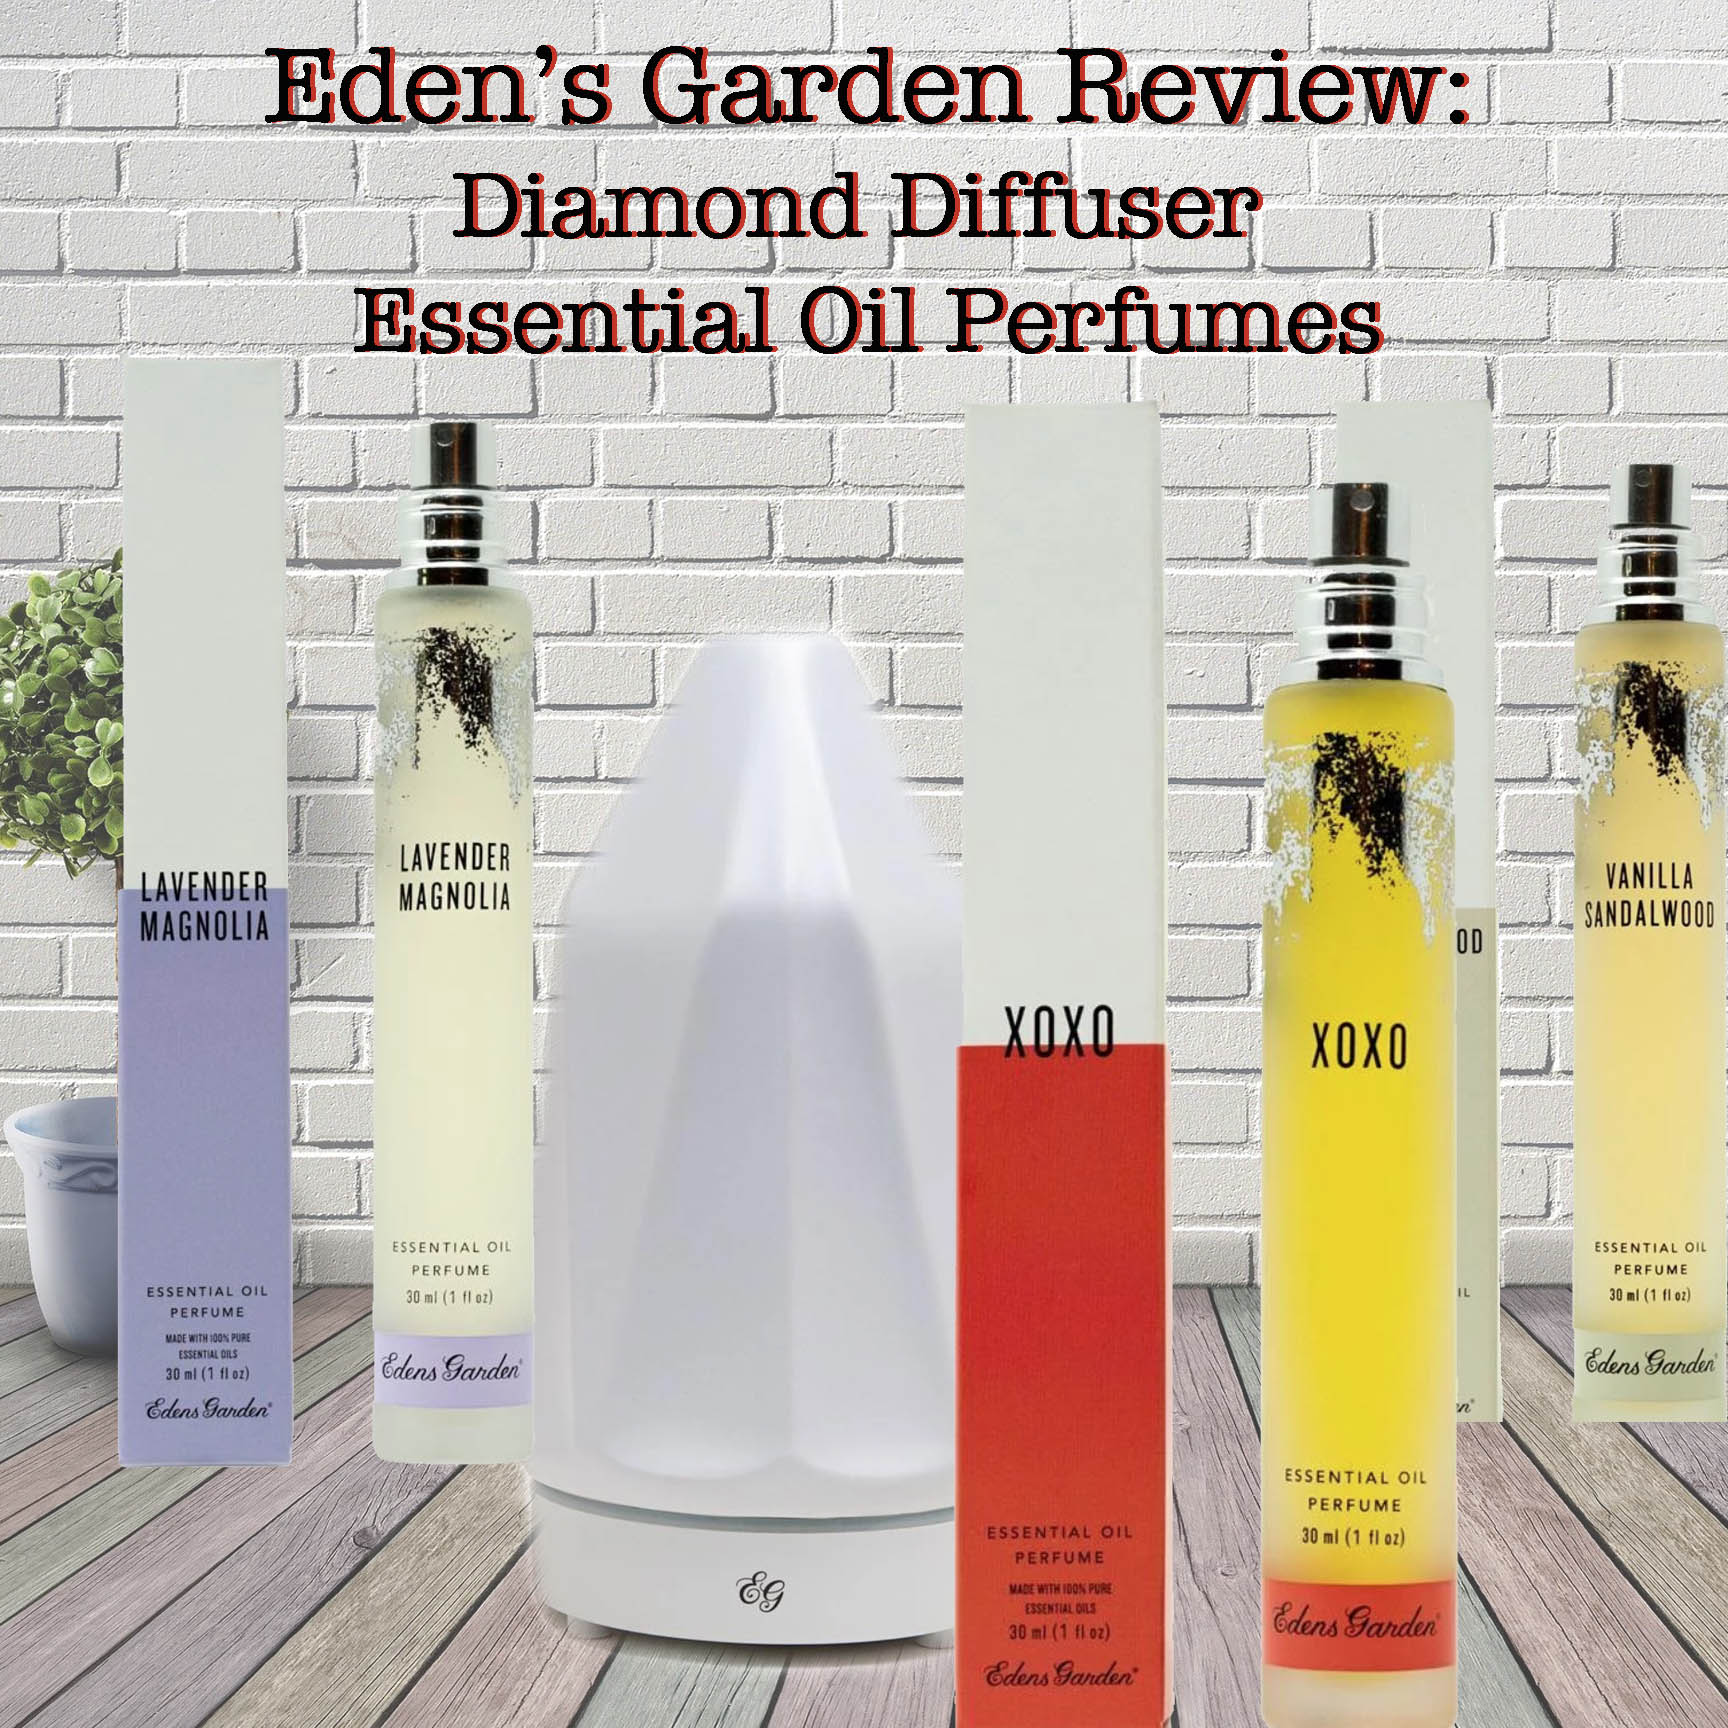 Eden's Garden Essential Oil Perfumes and Ceramic Diamond Diffuser Review